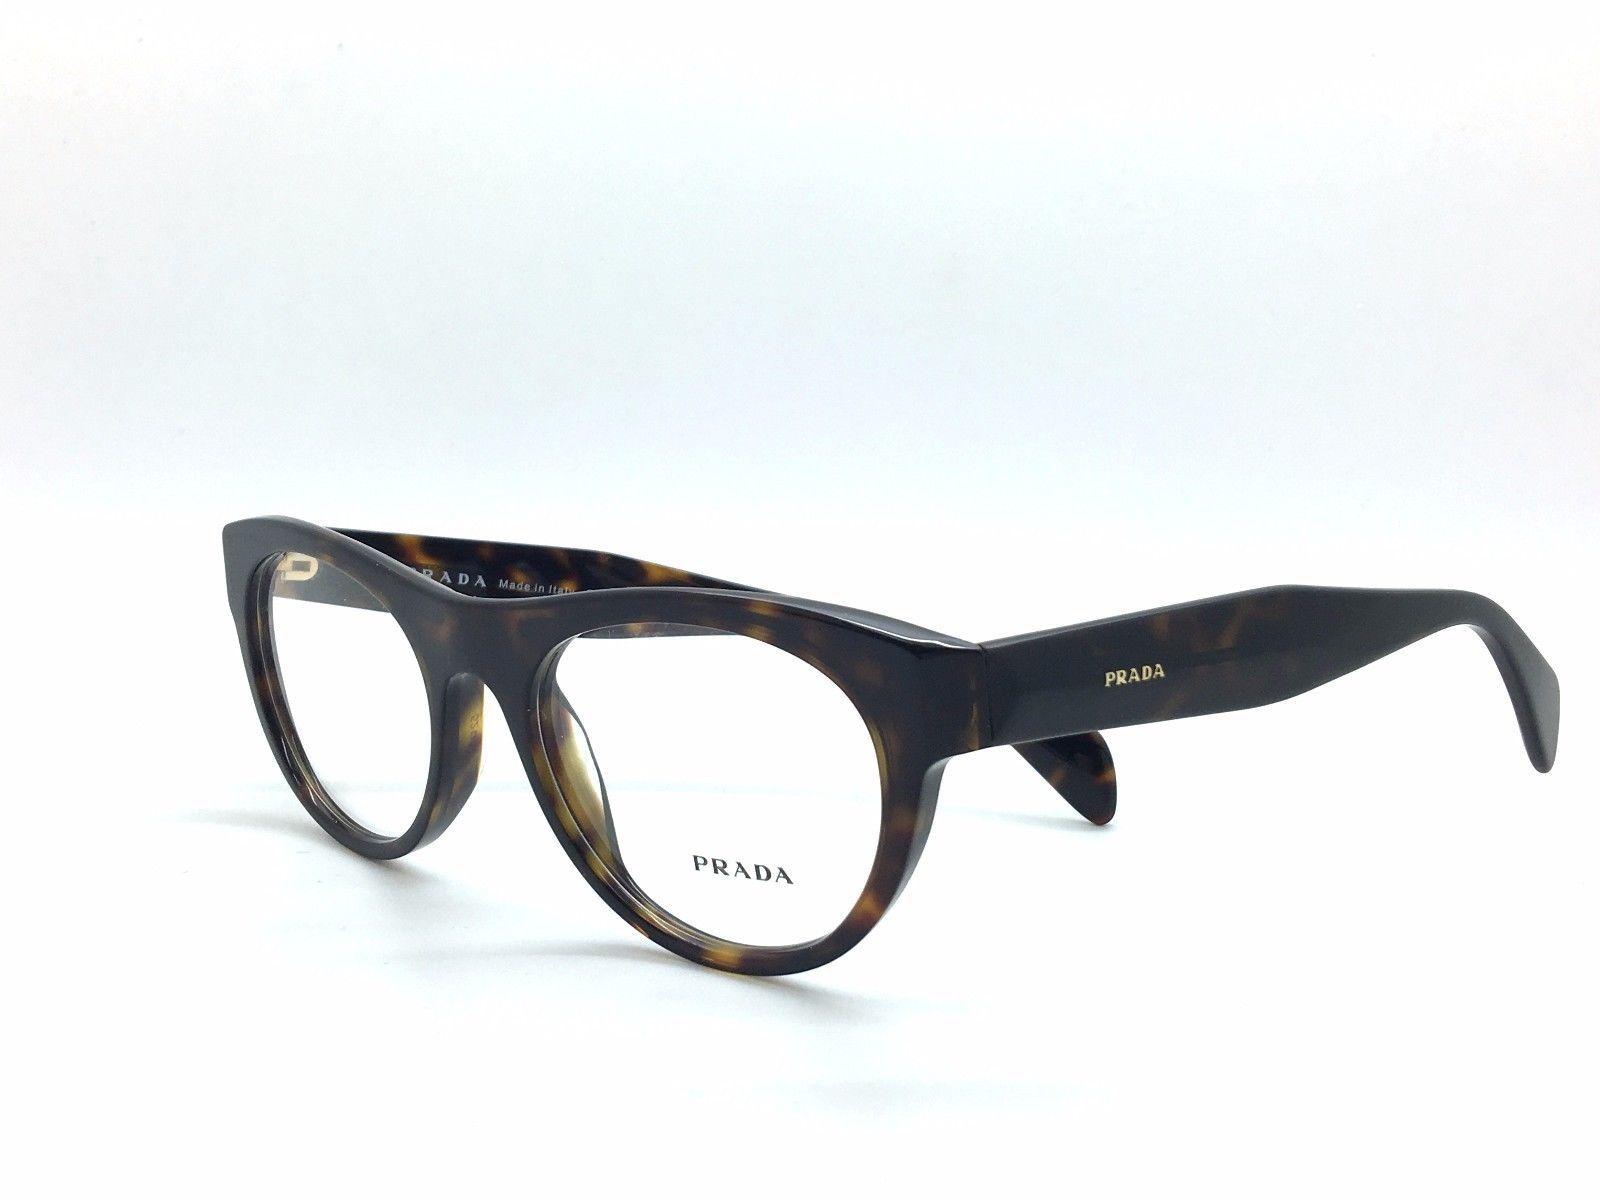 e6de897529b Prada Eyeglasses VPR 02Q 2AU-101 Havana Tortoise Frame Italy New 52mm  Authentic